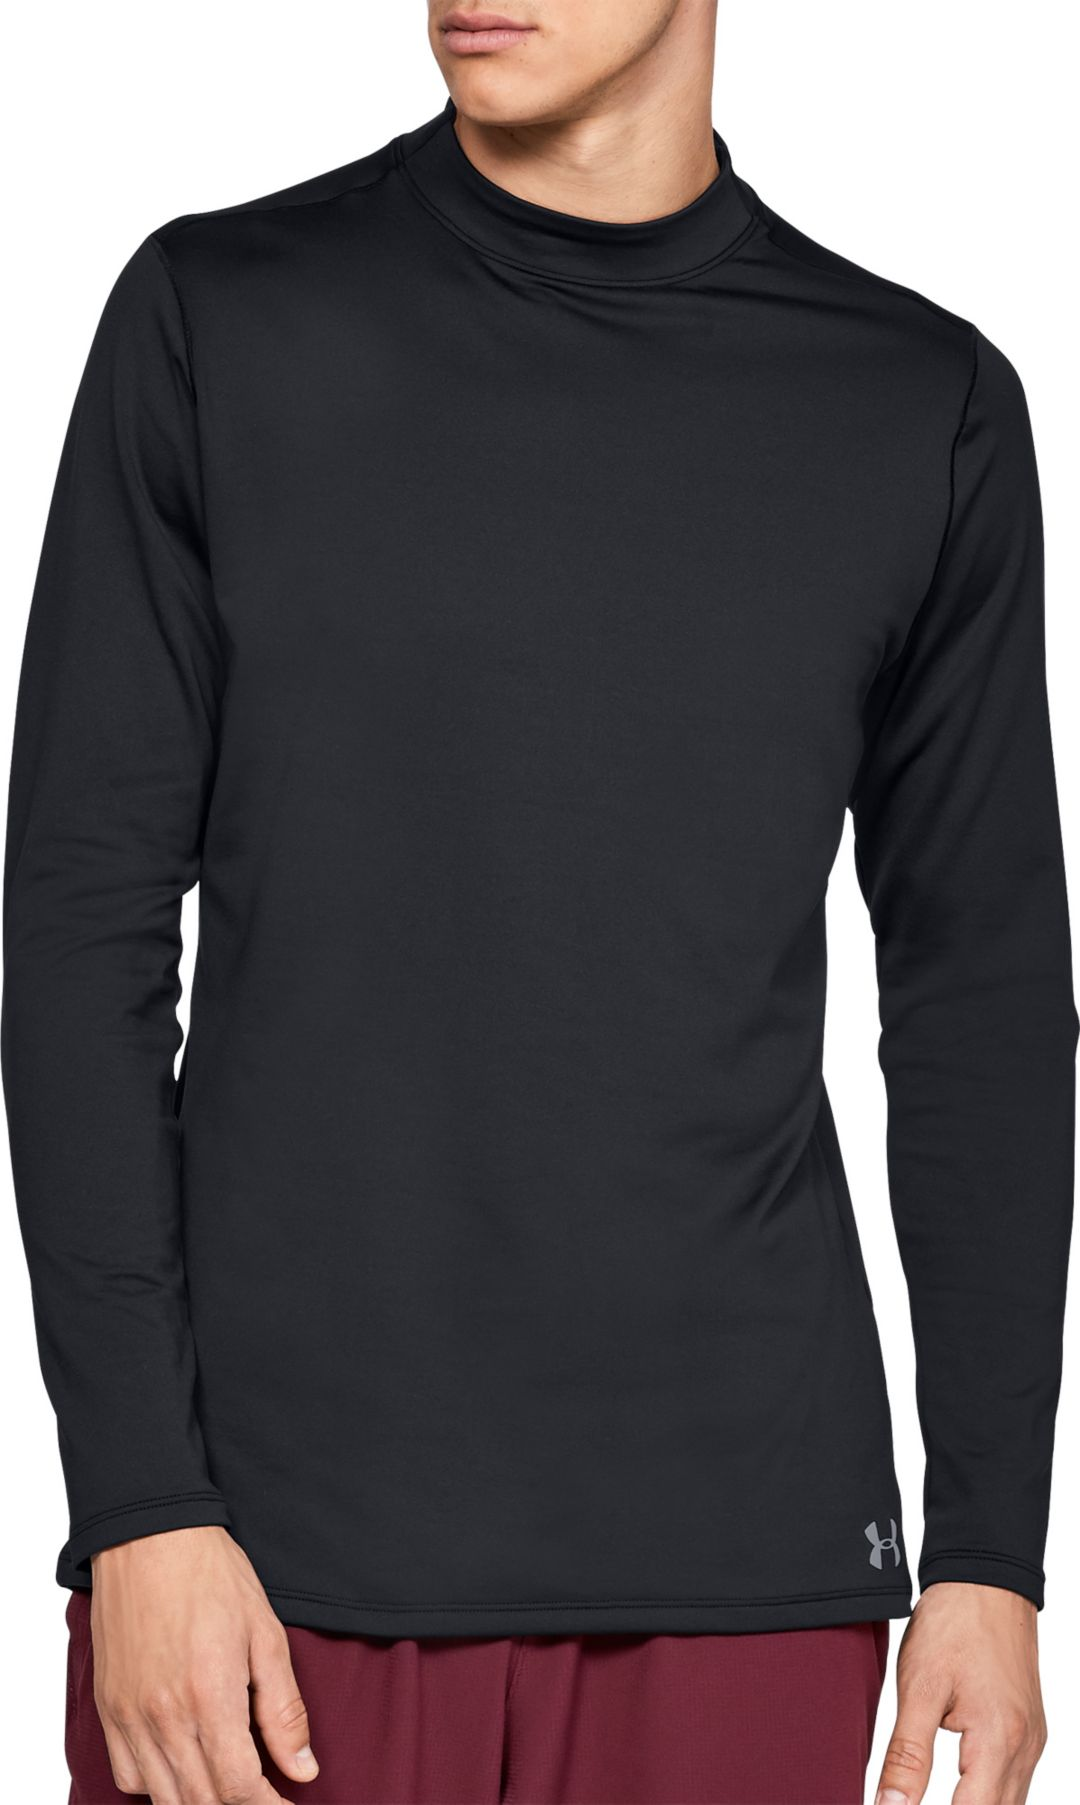 0c4456f34 Under Armour Men's ColdGear Armour Mock Neck Long Sleeve Shirt.  noImageFound. Previous